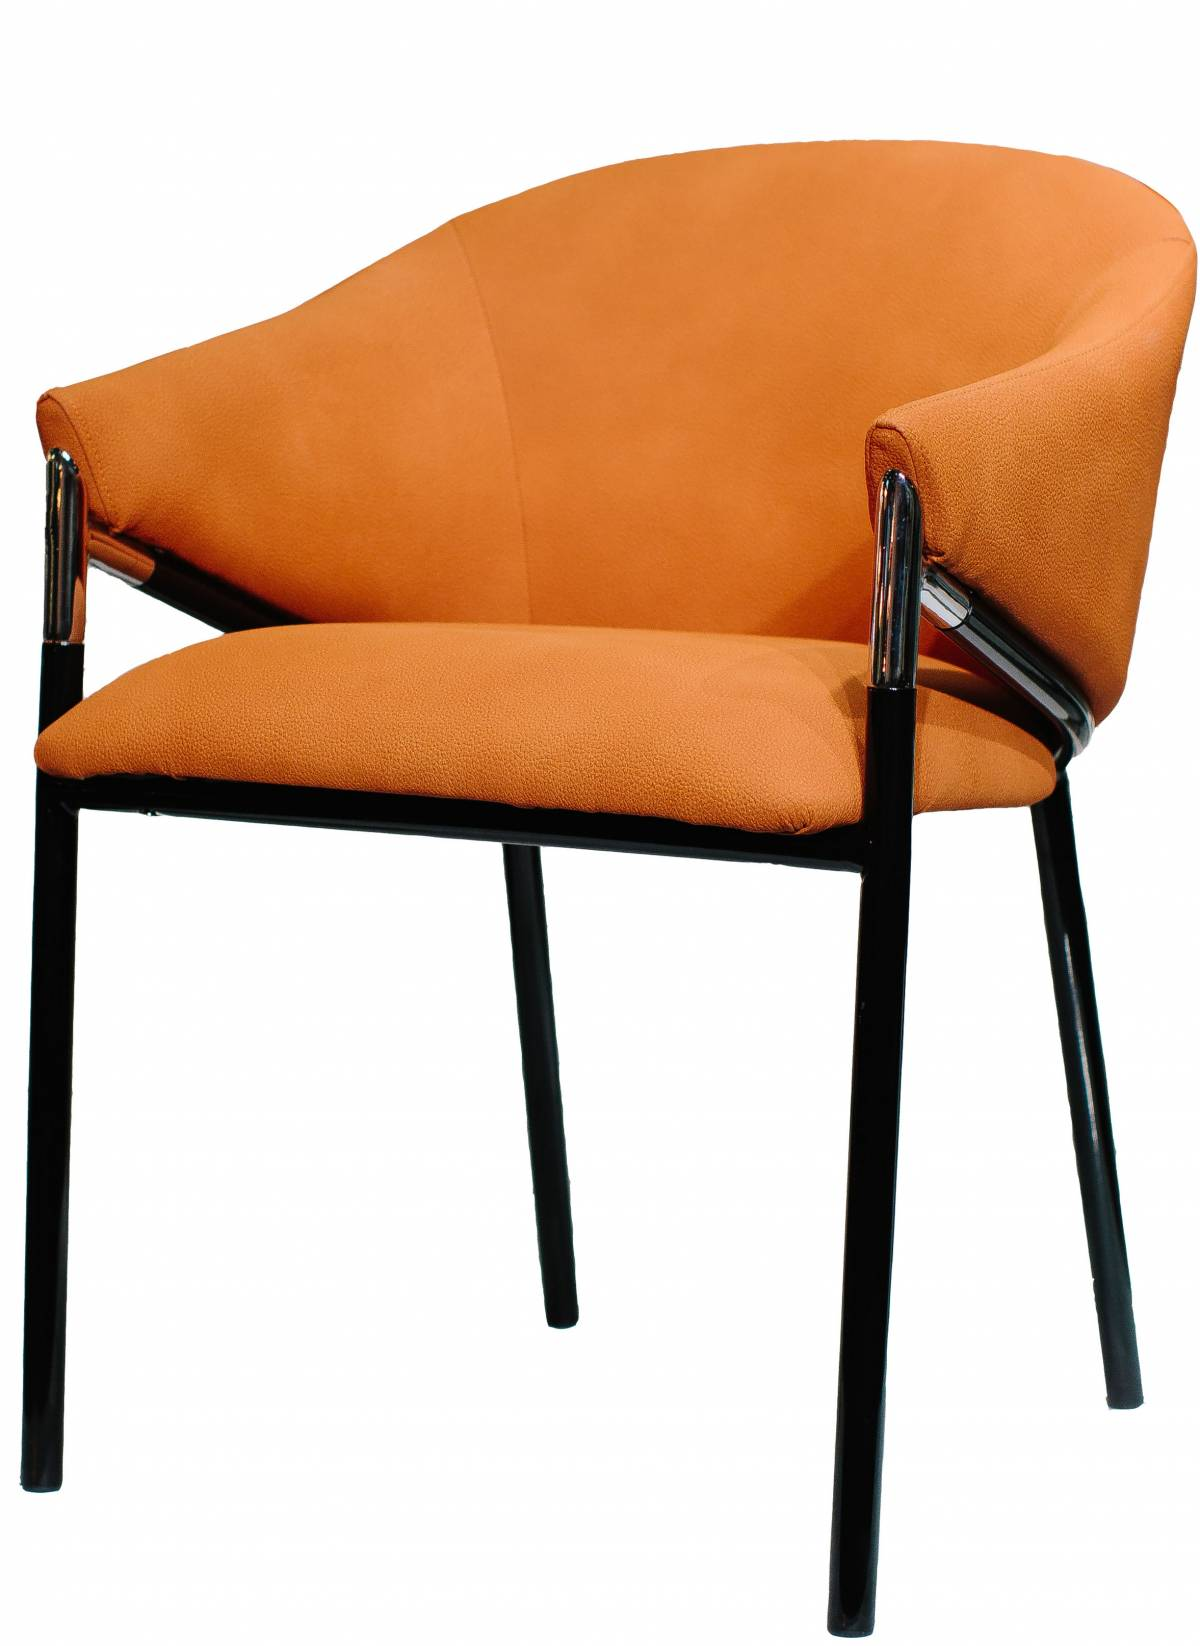 Металлический стул Melody в Raroom фото